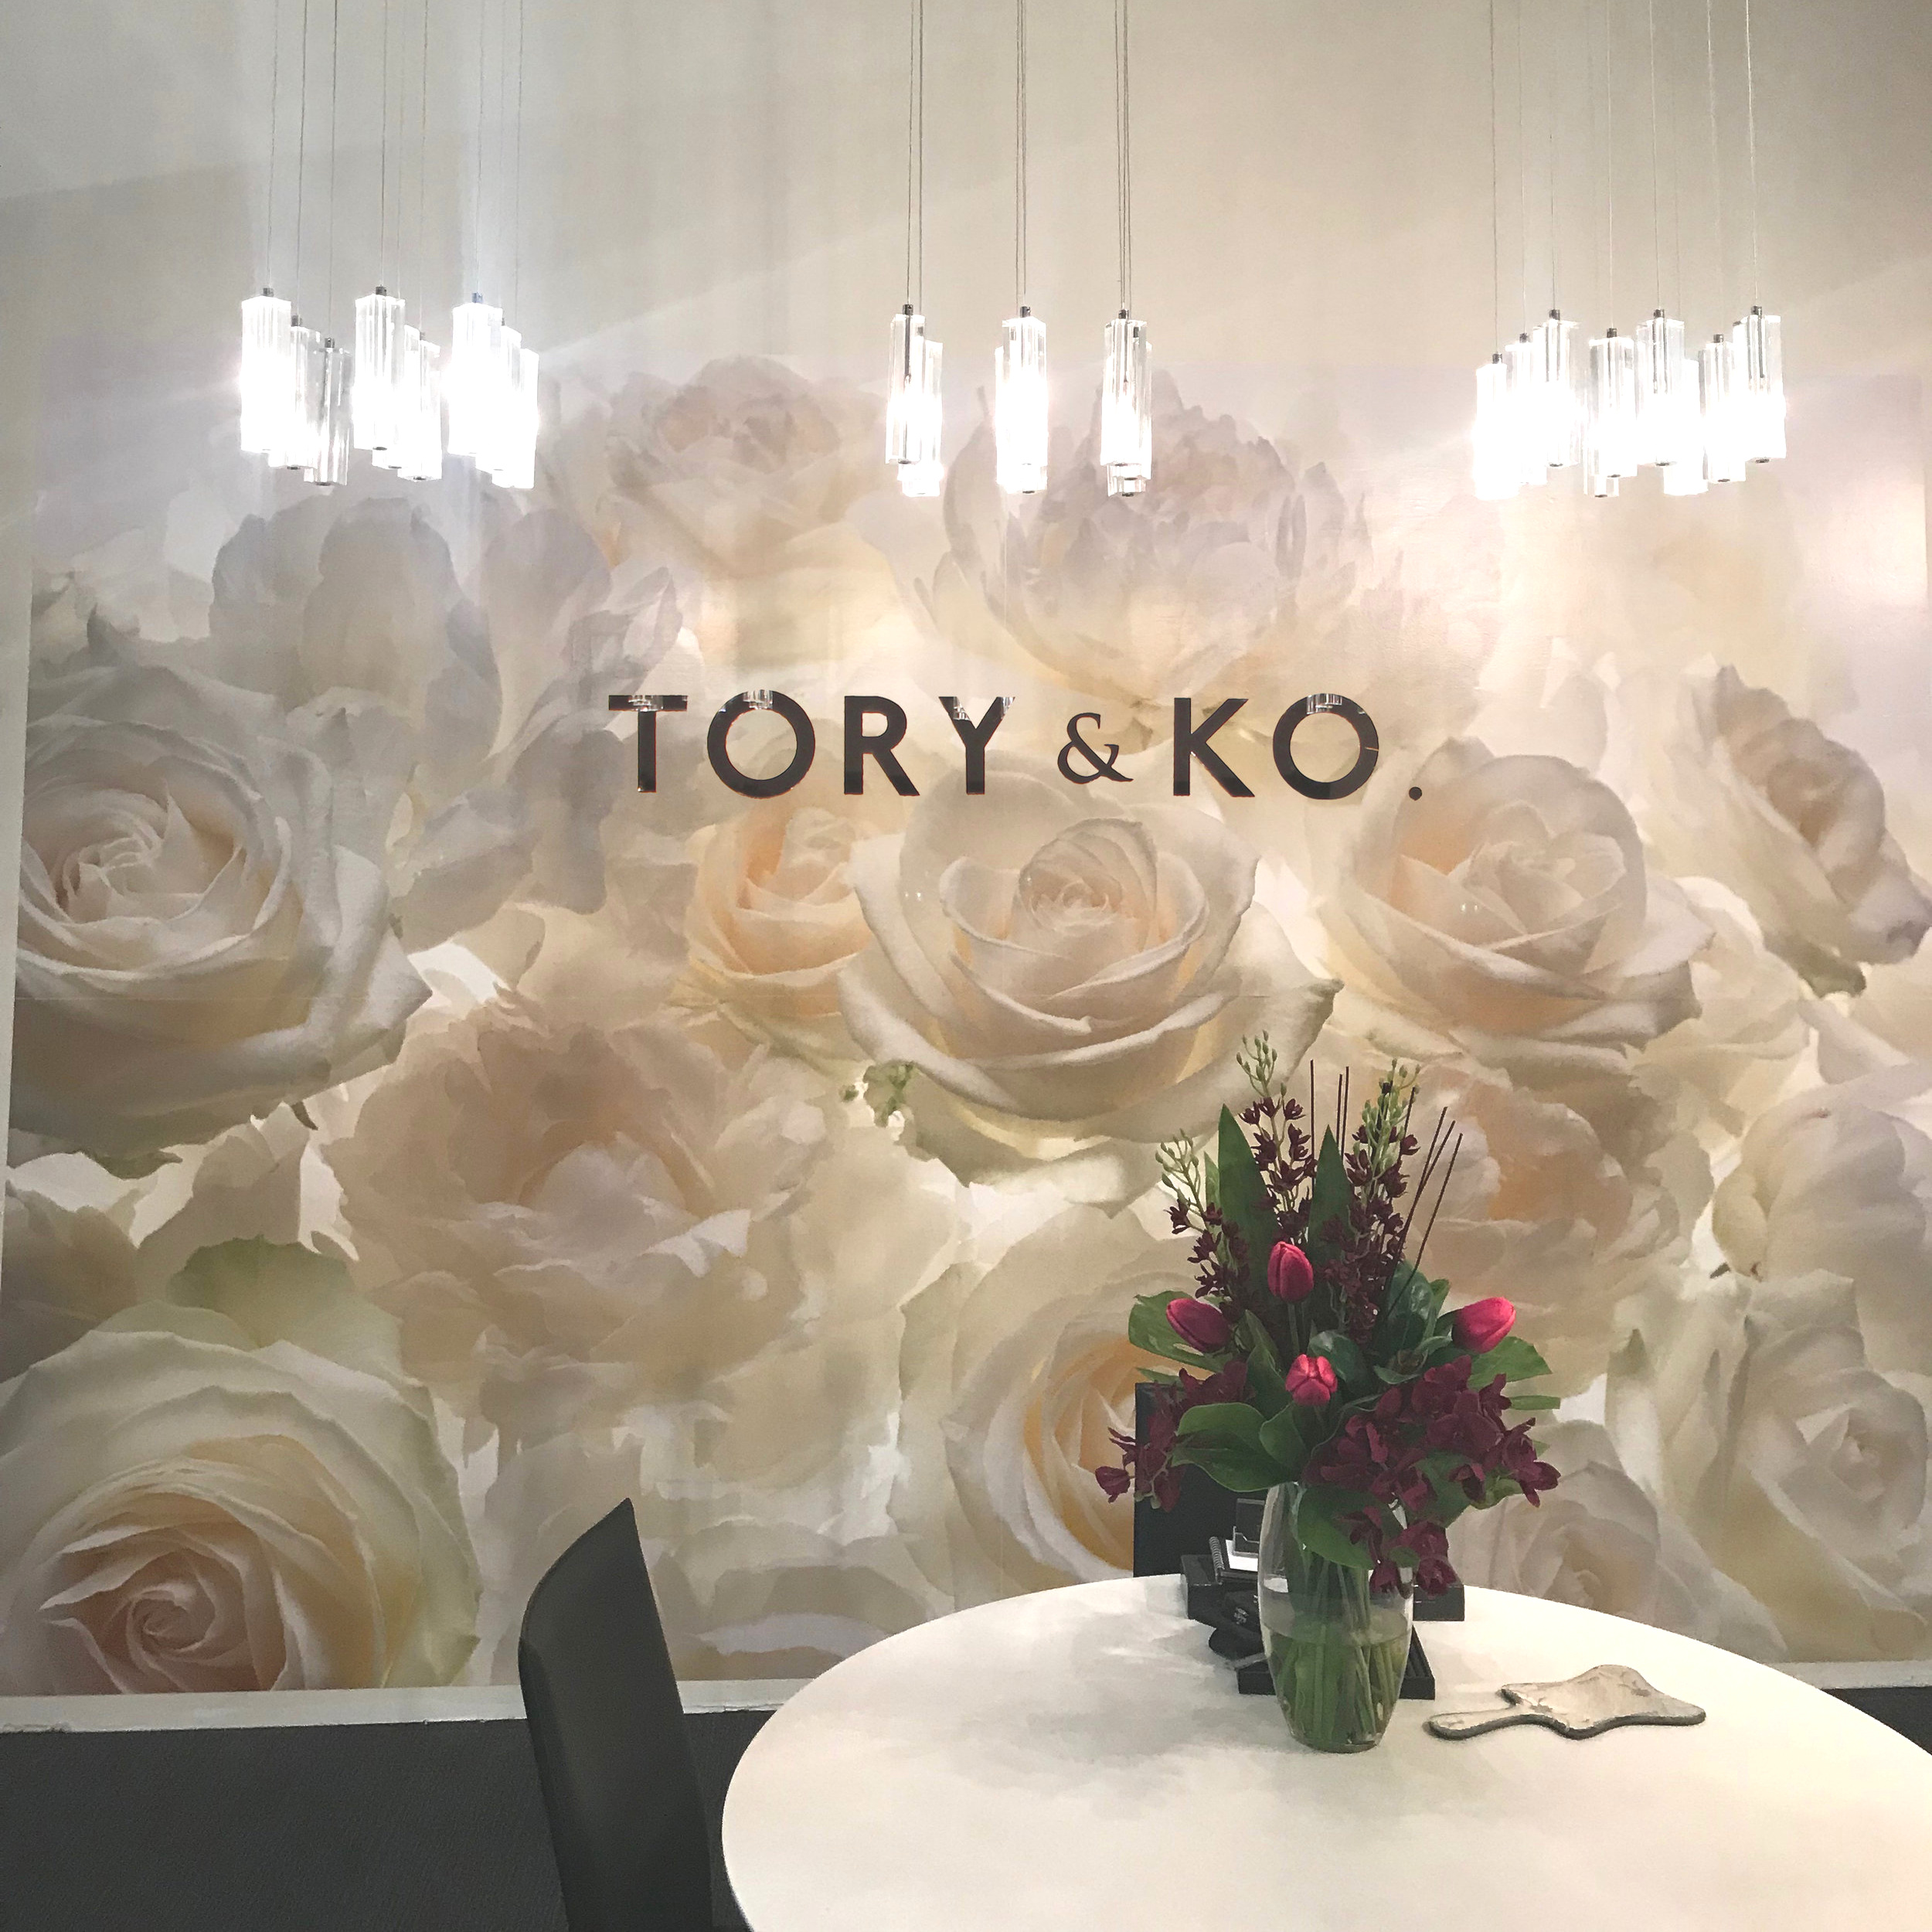 TORY & KO. Mezzanine Floor Boutique